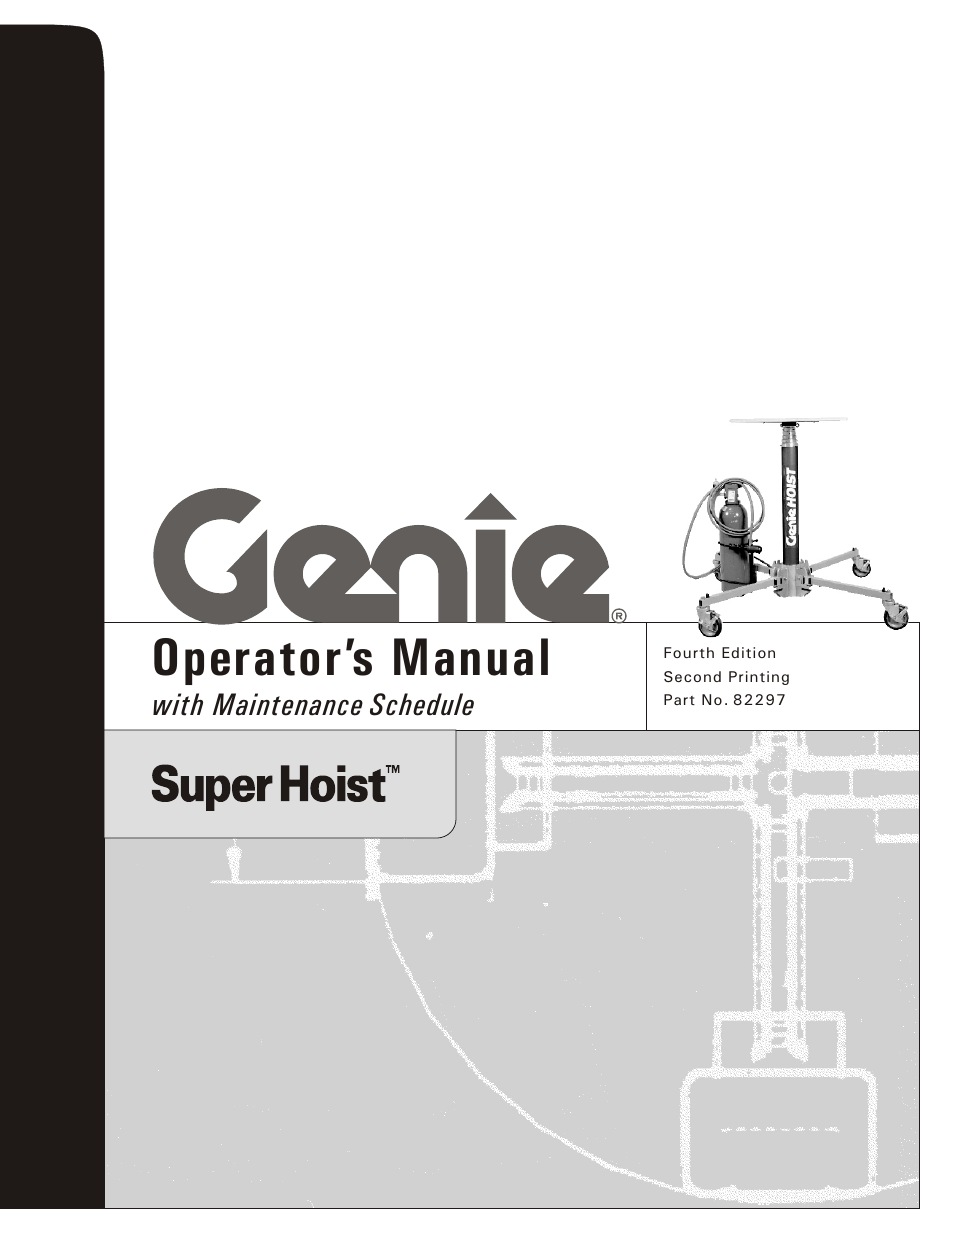 Genie SUPER HOIST 82297 User Manual | 16 pages